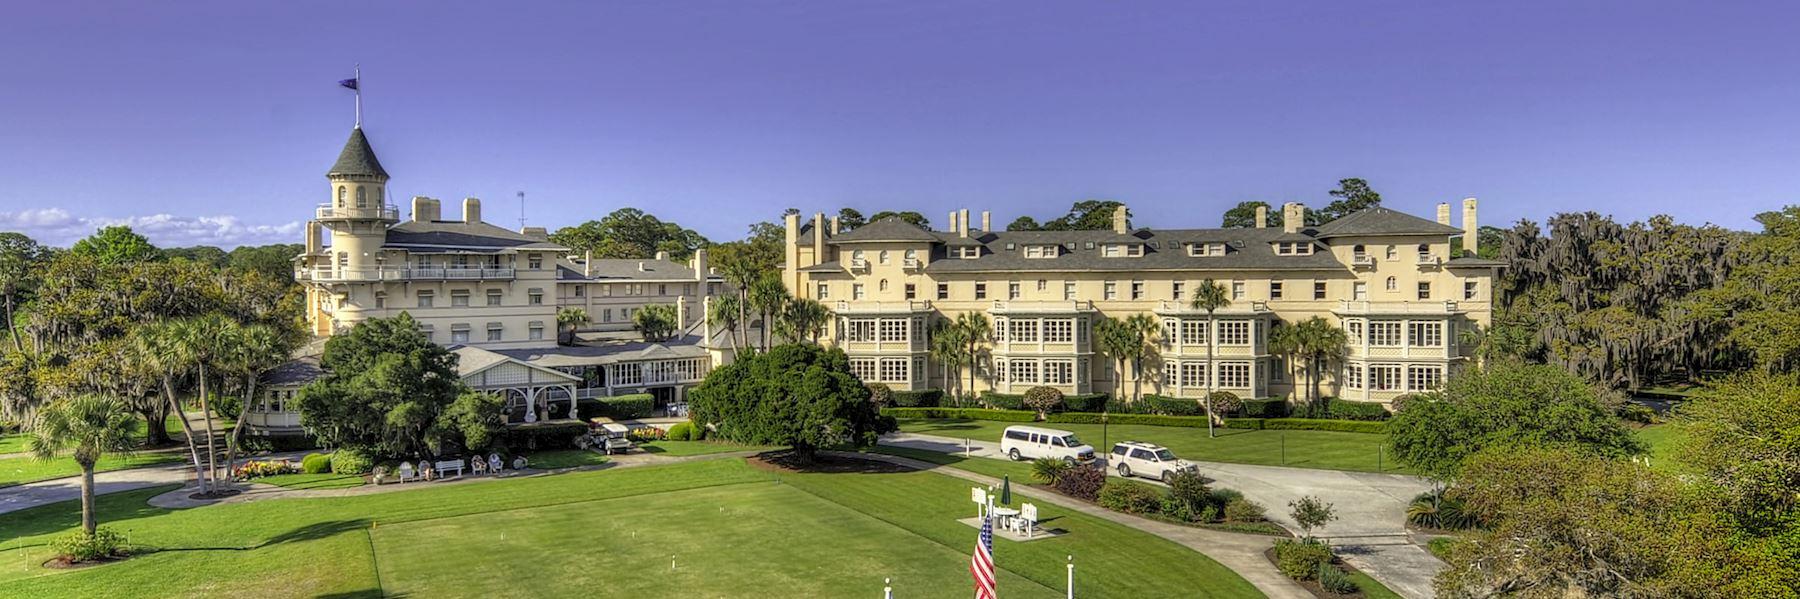 Permalink to Jekyll Island Hotels